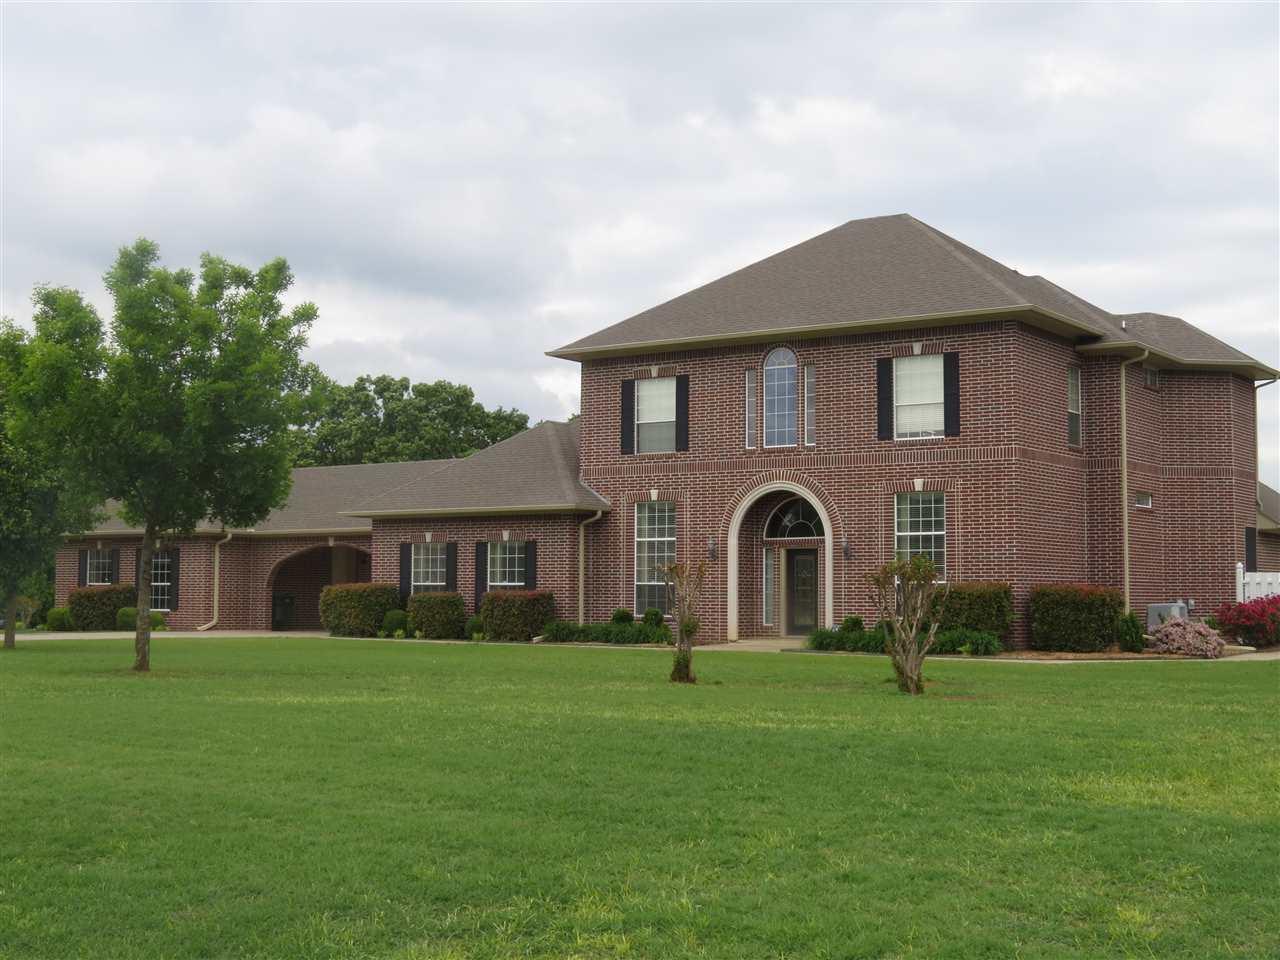 Real Estate for Sale, ListingId: 33035341, Durant,OK74701